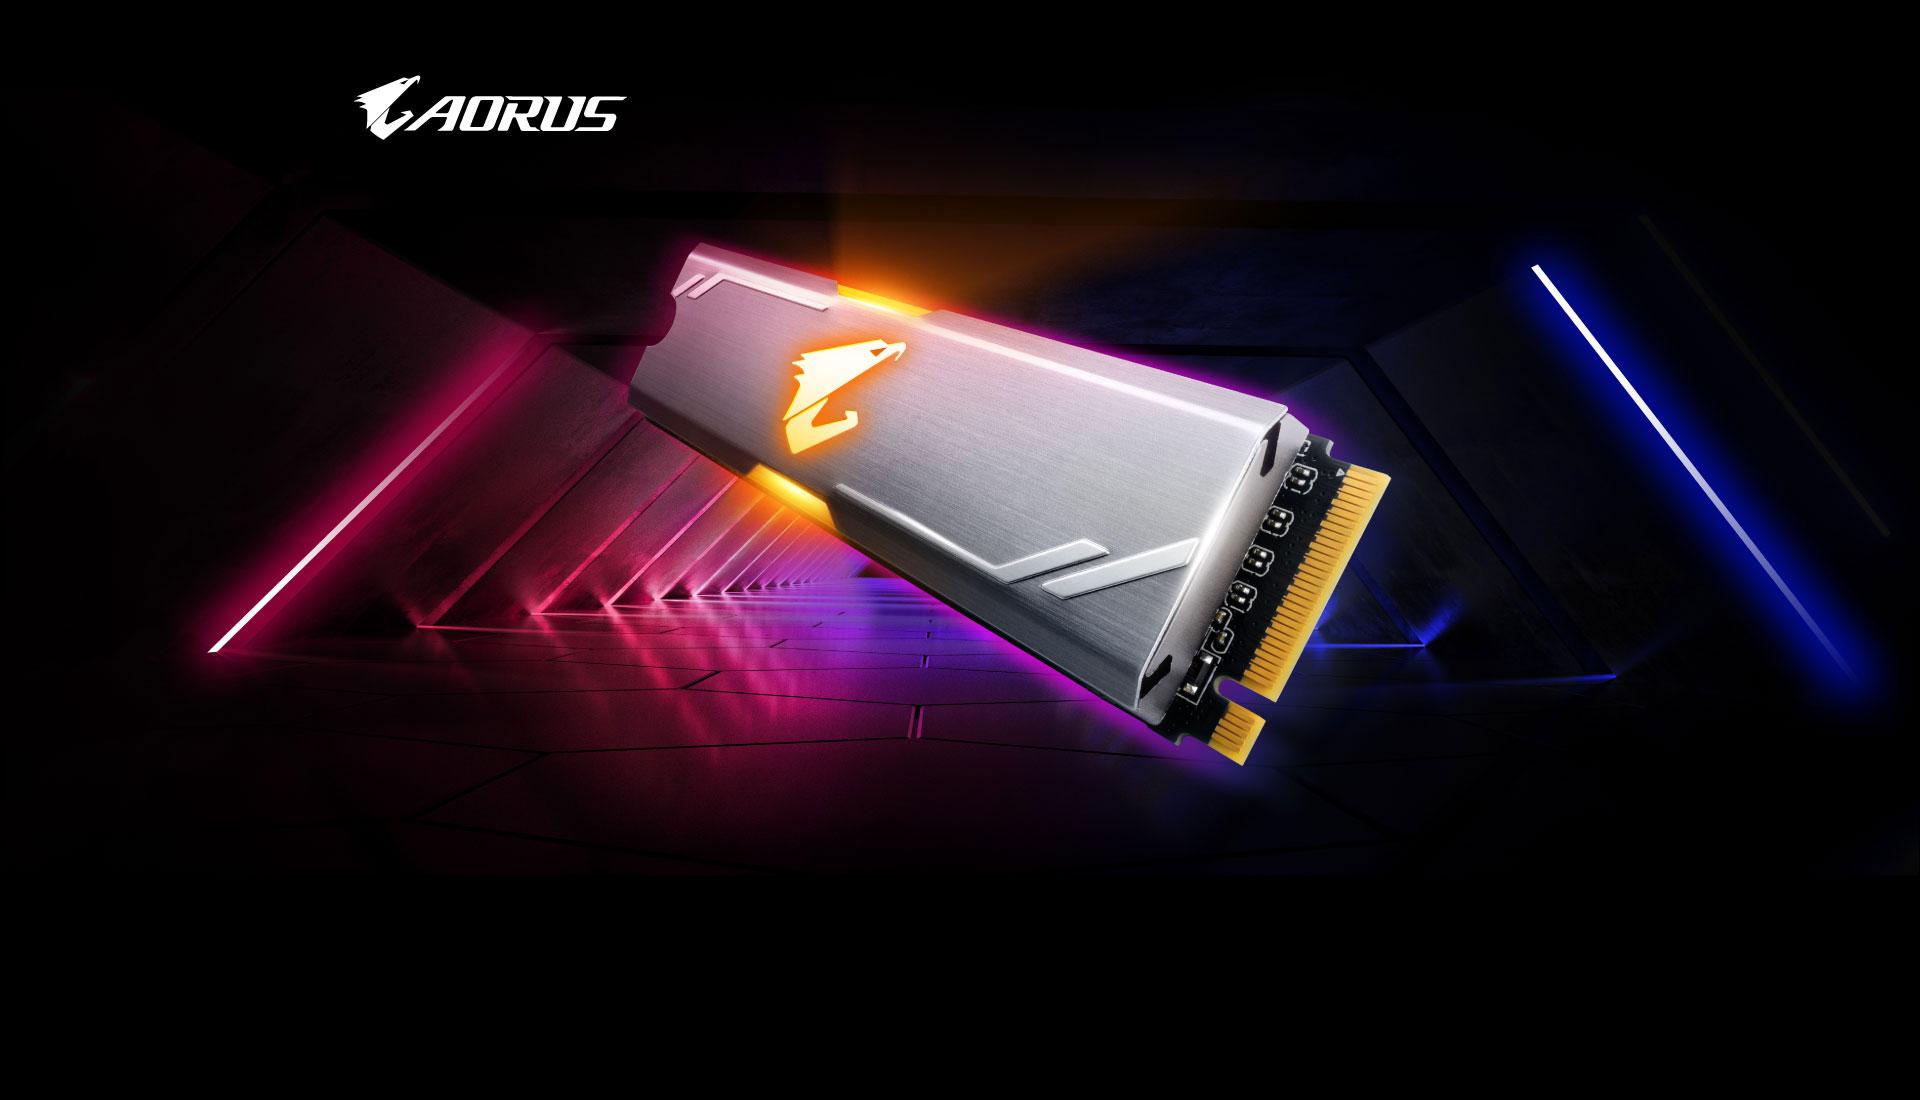 AORUS RGB M 2 NVMe SSD 512GB | Solid State Drive (SSD